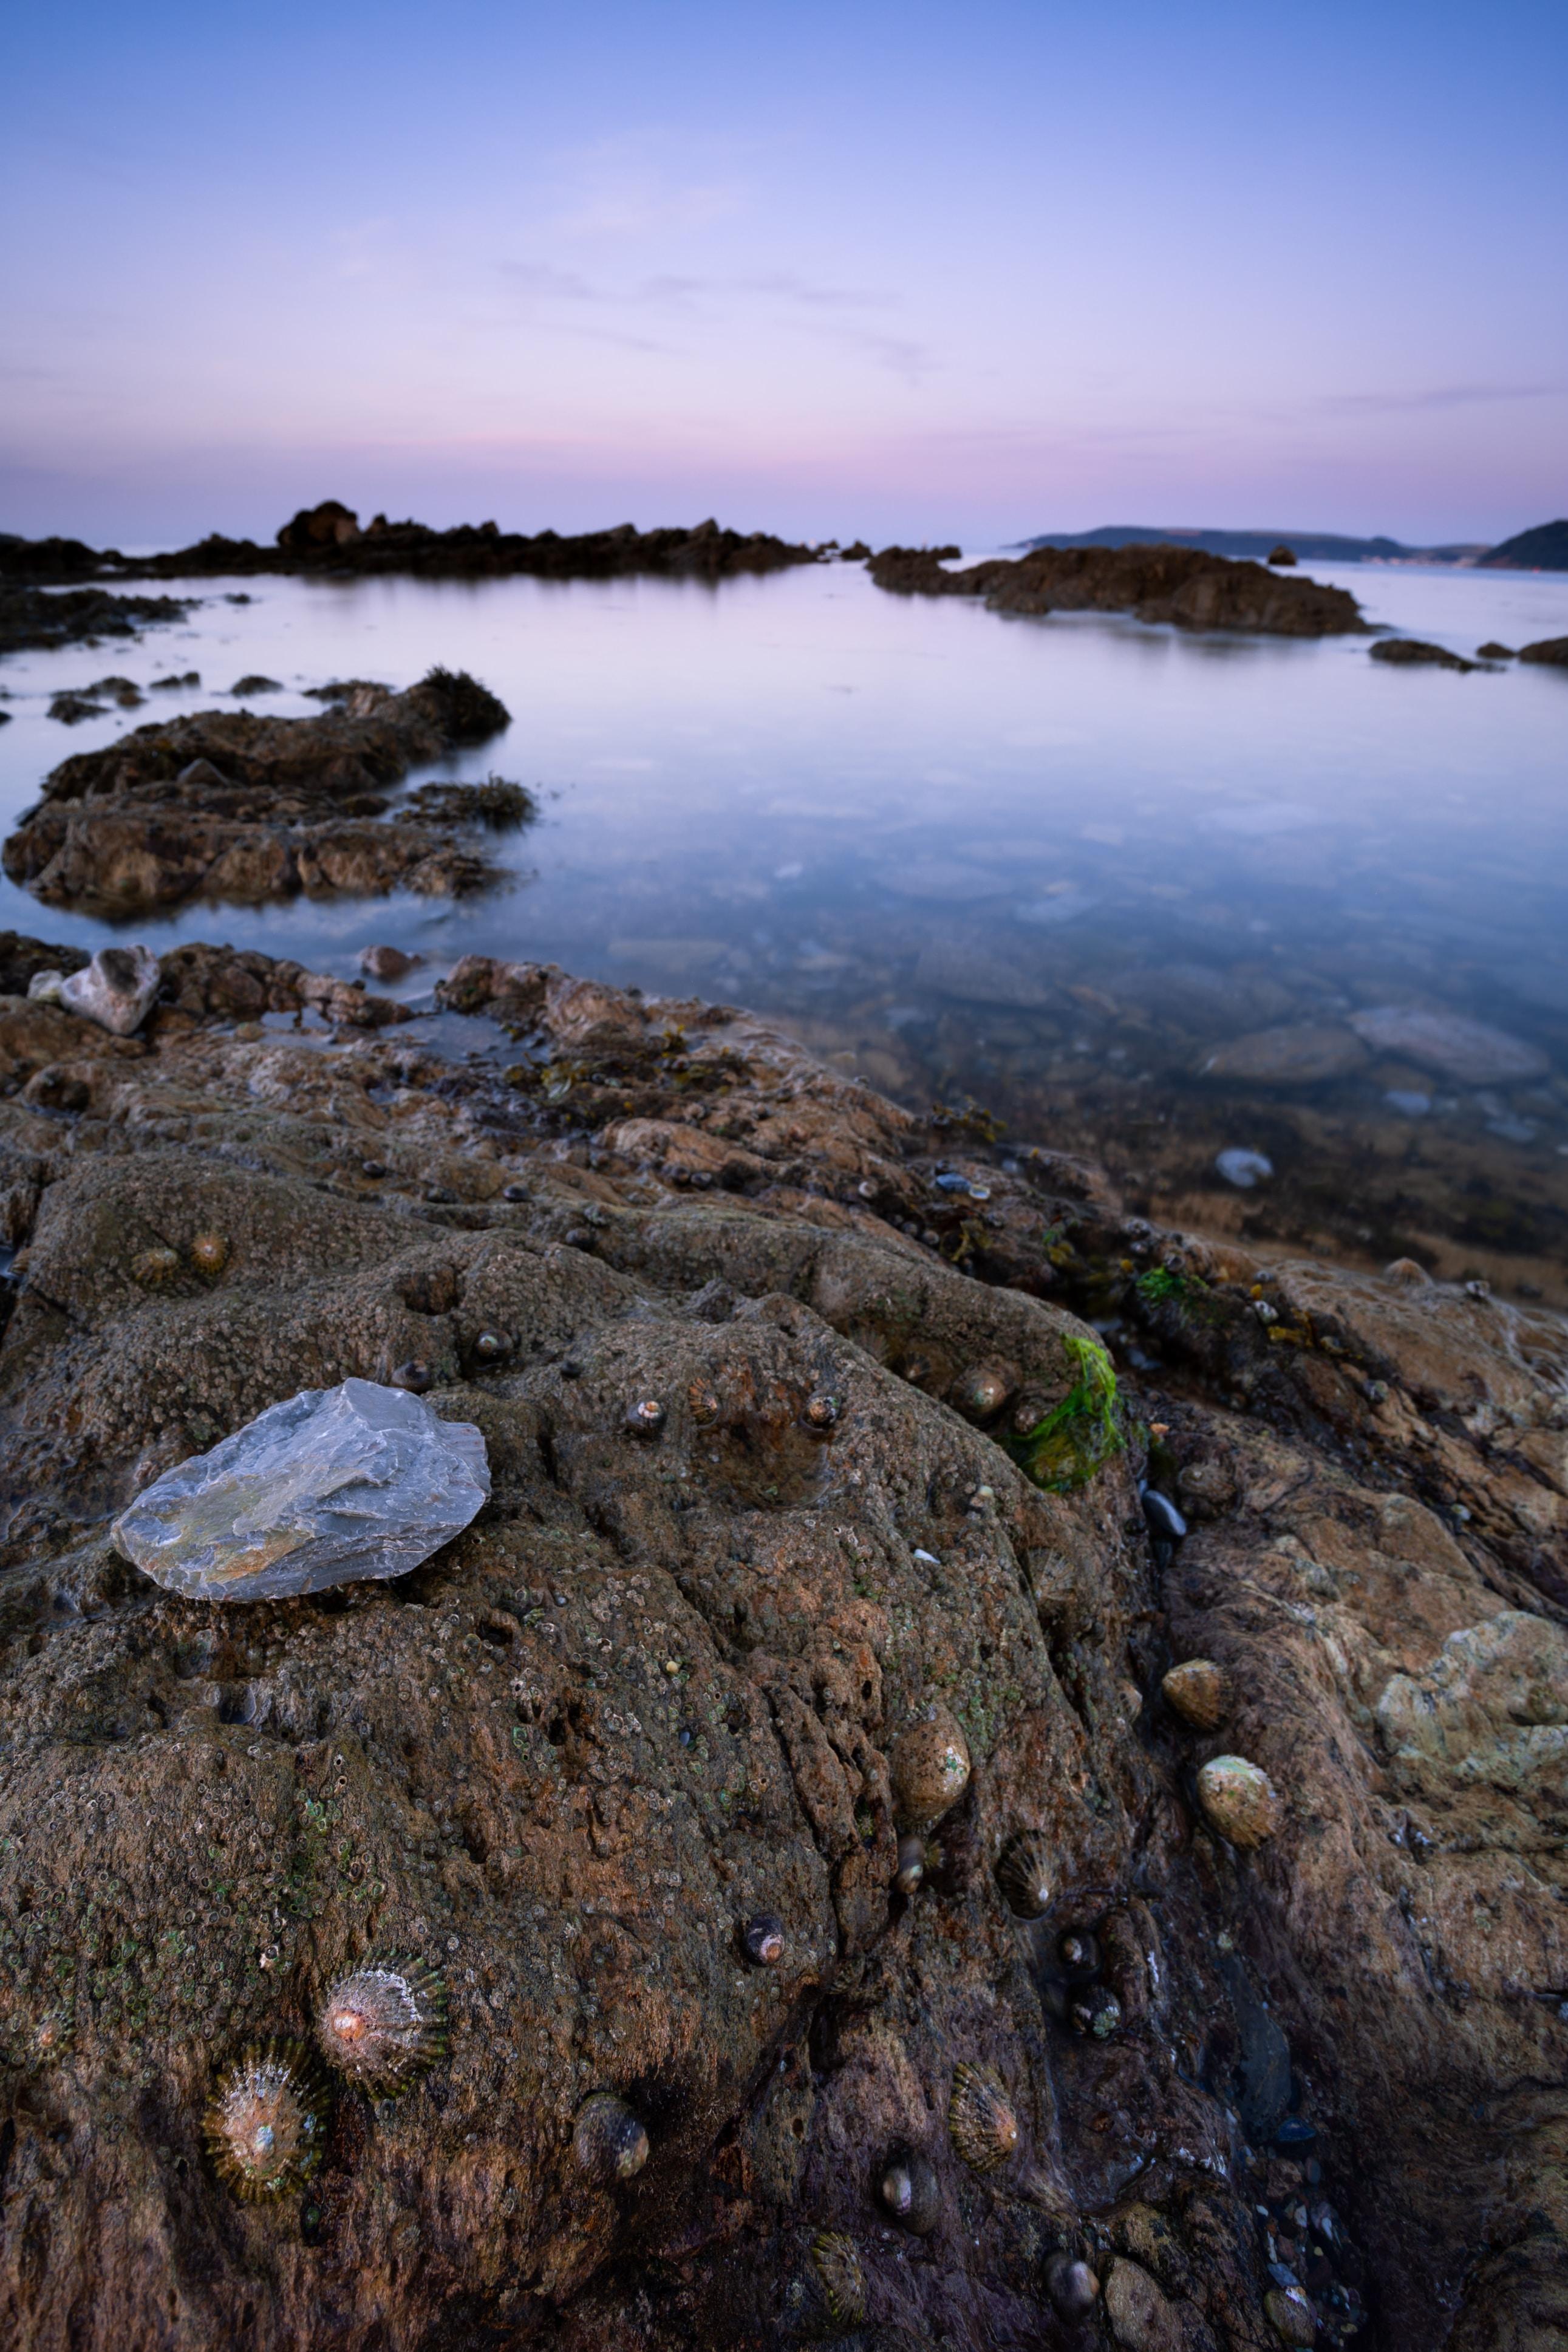 photo of rocks near body of water